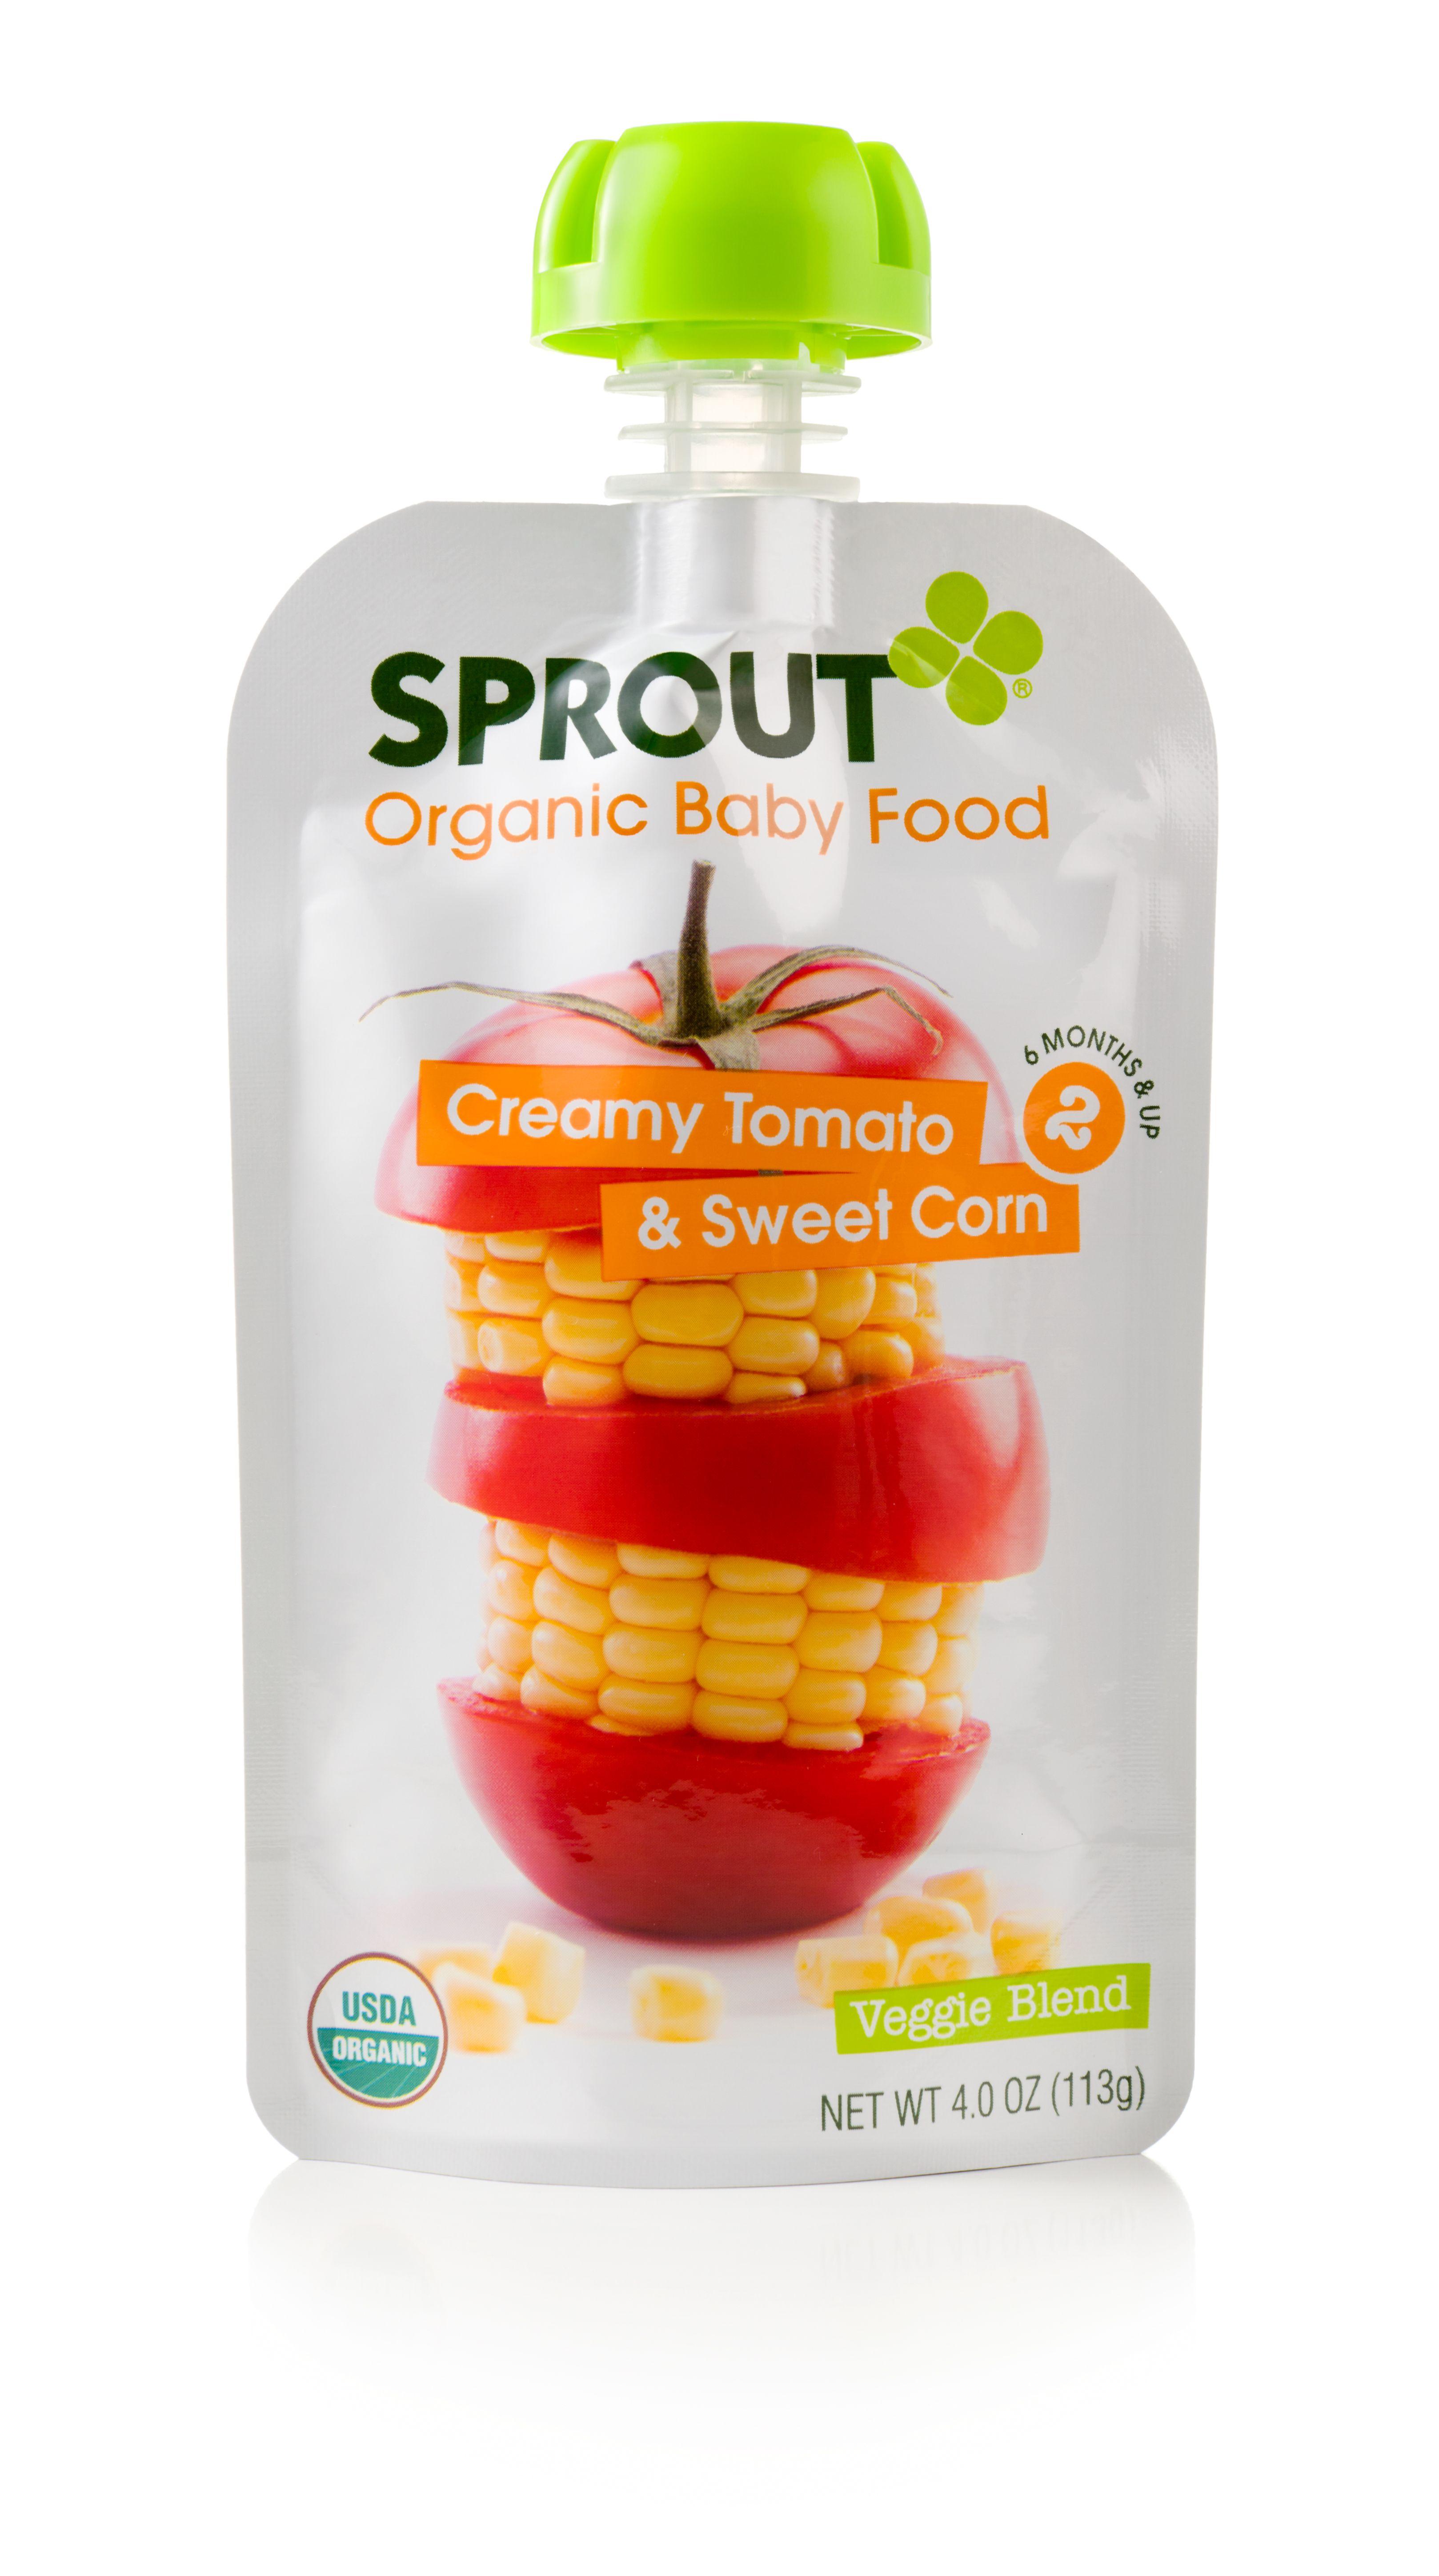 Organic Baby Food Organic gardening the correct way ...